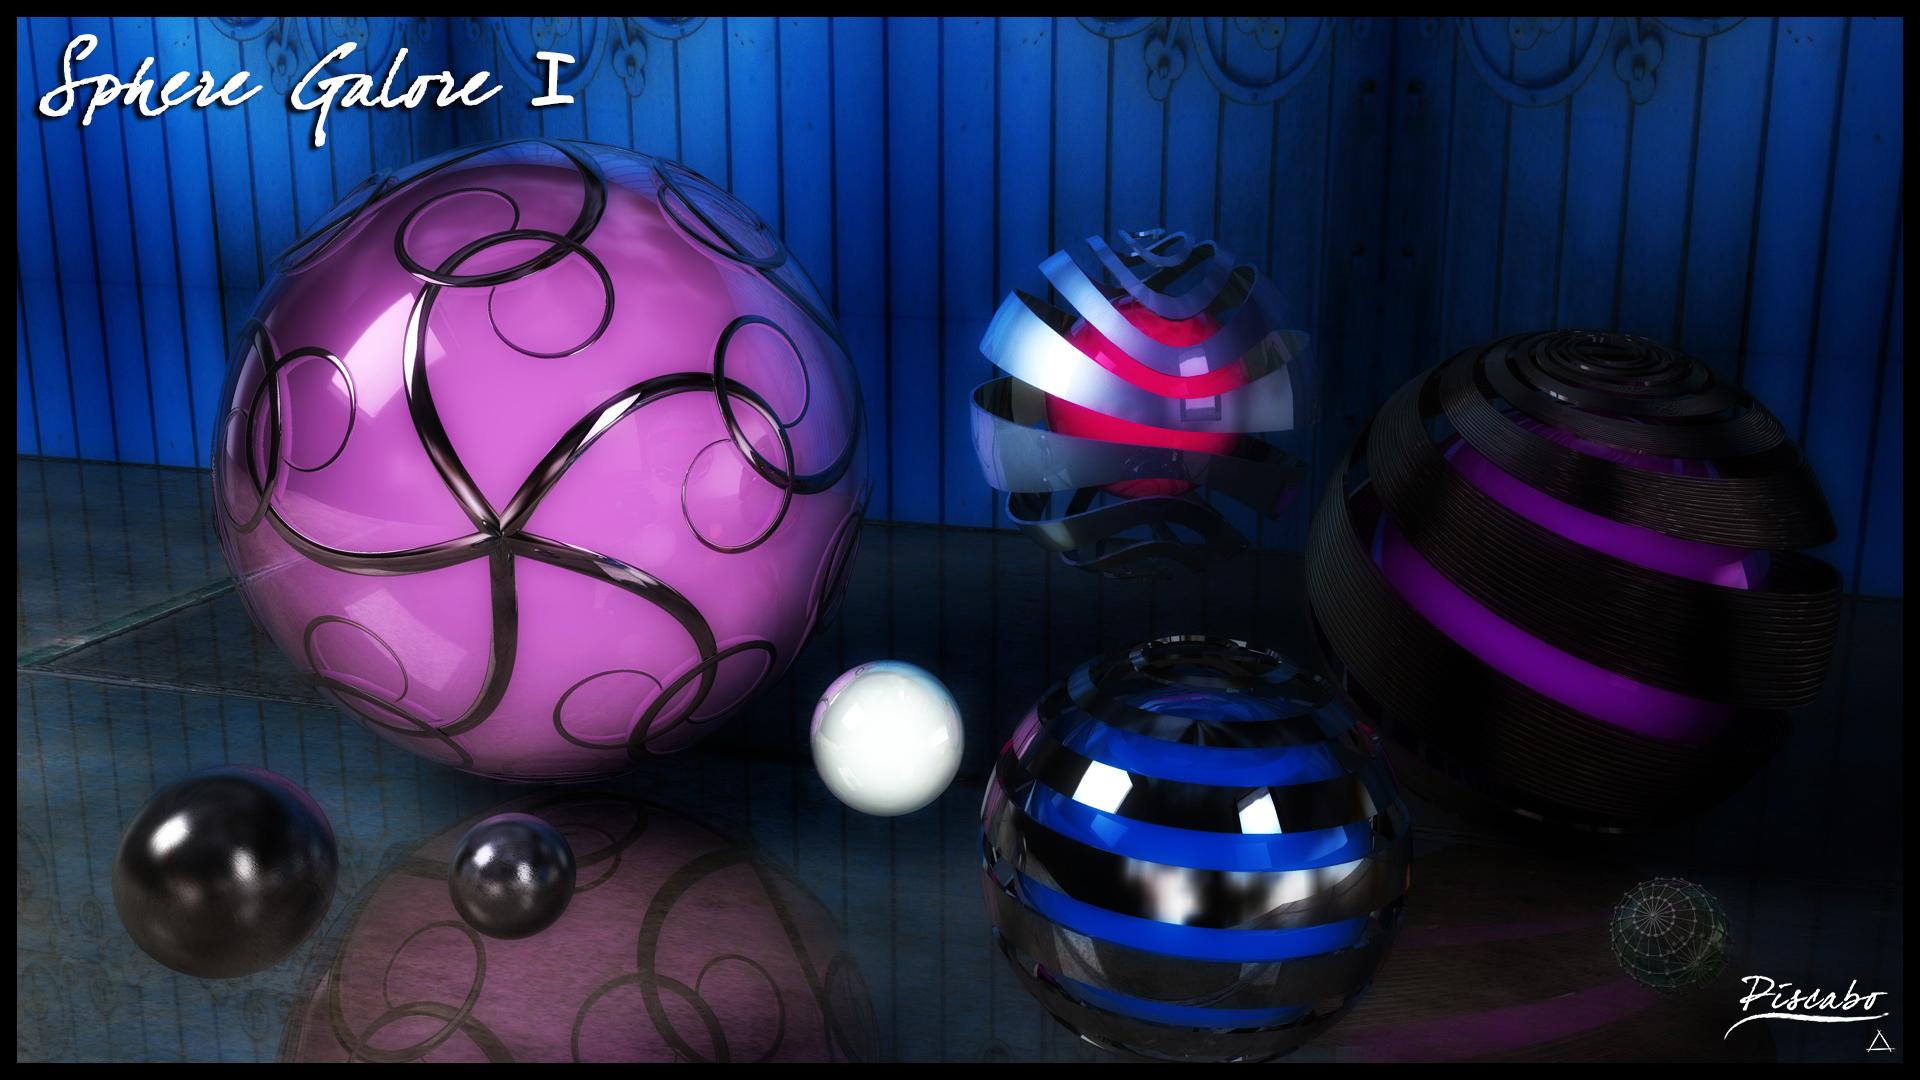 Sphere's Galore I by FracZky